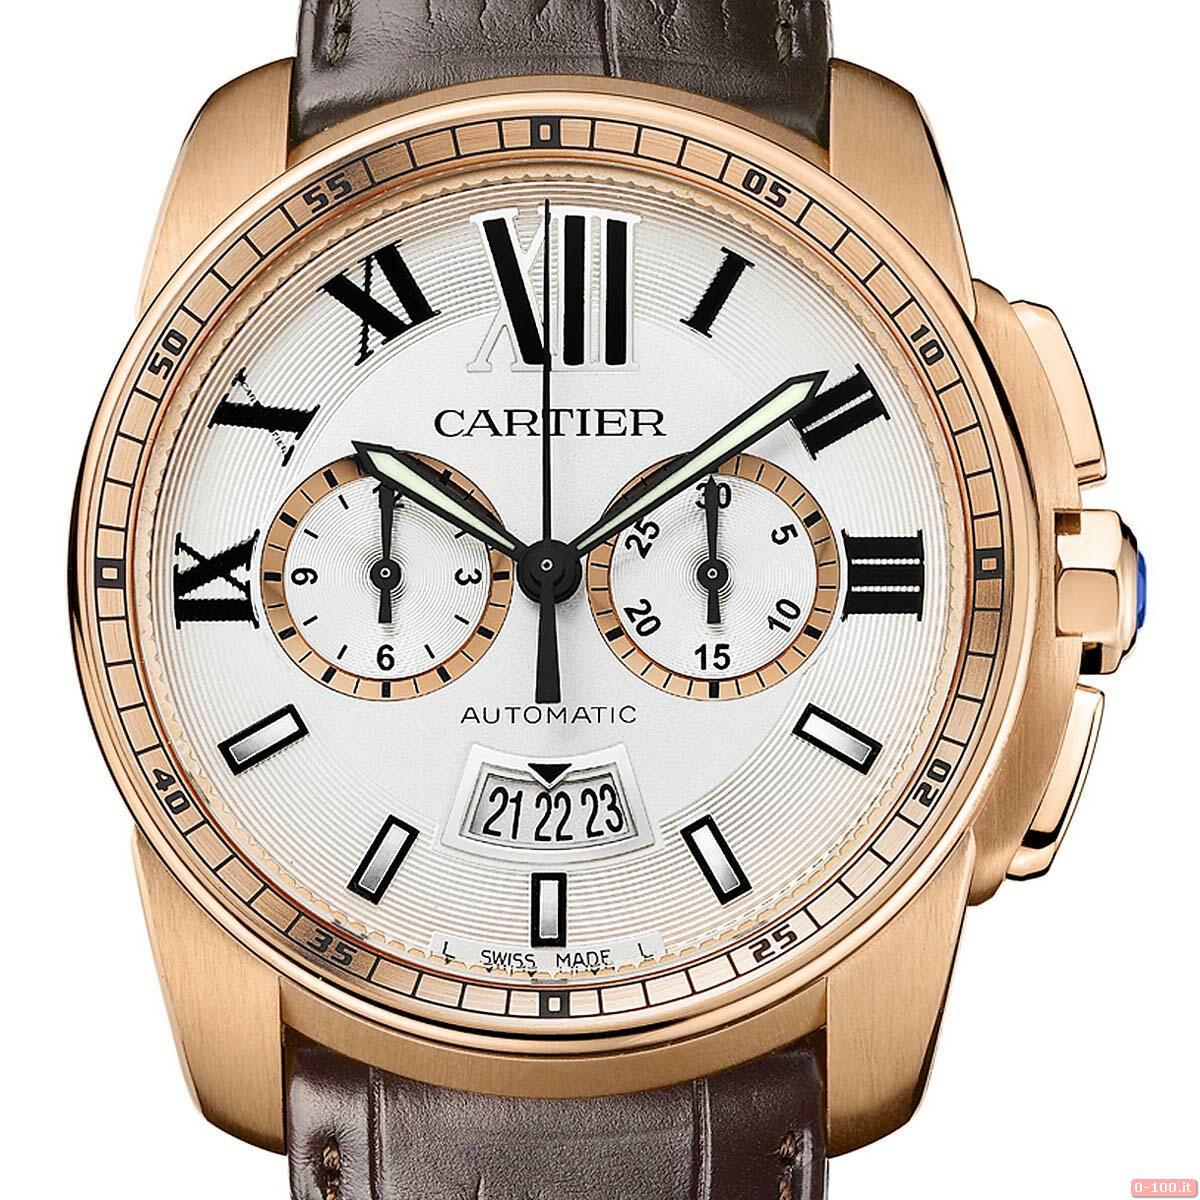 Cartier Calibre Chronograph Watch _0-1002